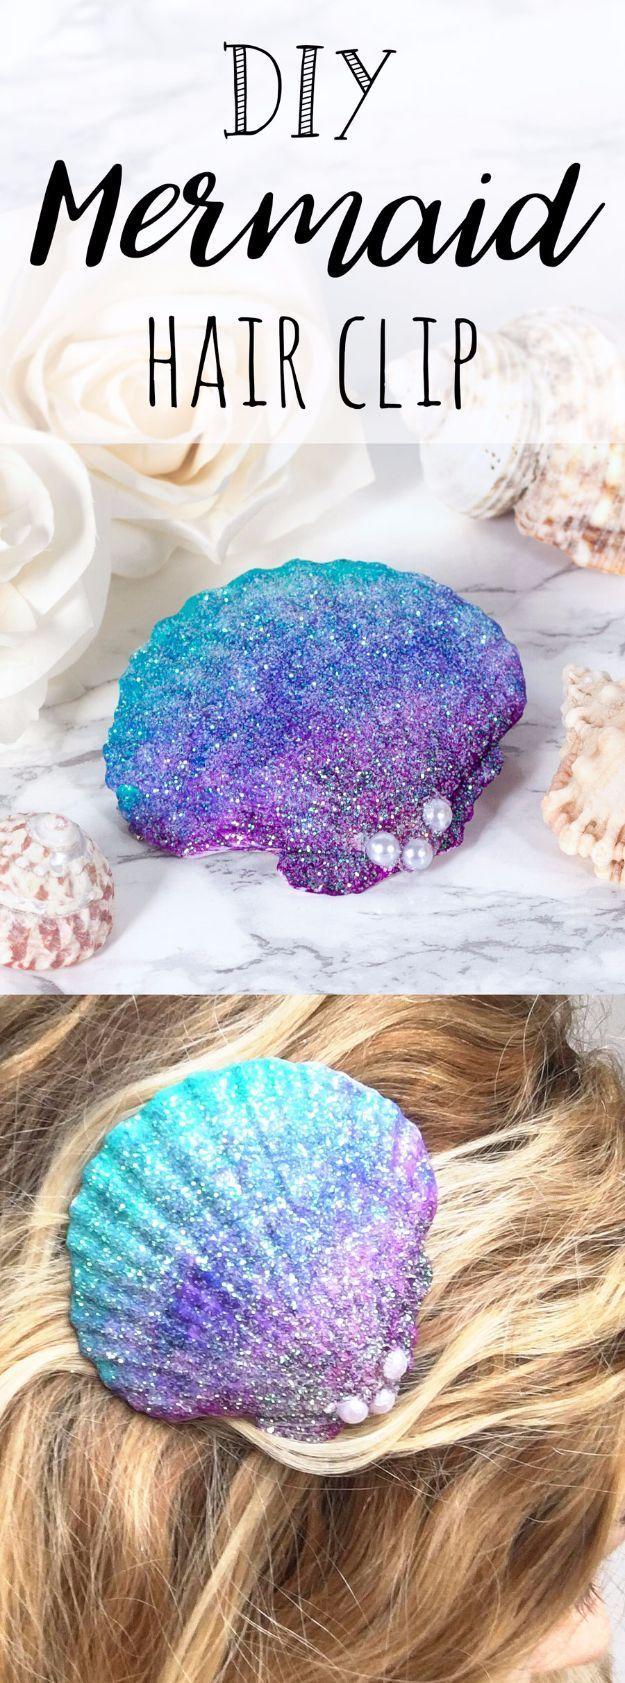 Photo of DIY Mermaid Crafts – DIY Mermaid Hair Clip – How To Make Room Decorations, Art P…,  #Art #C…